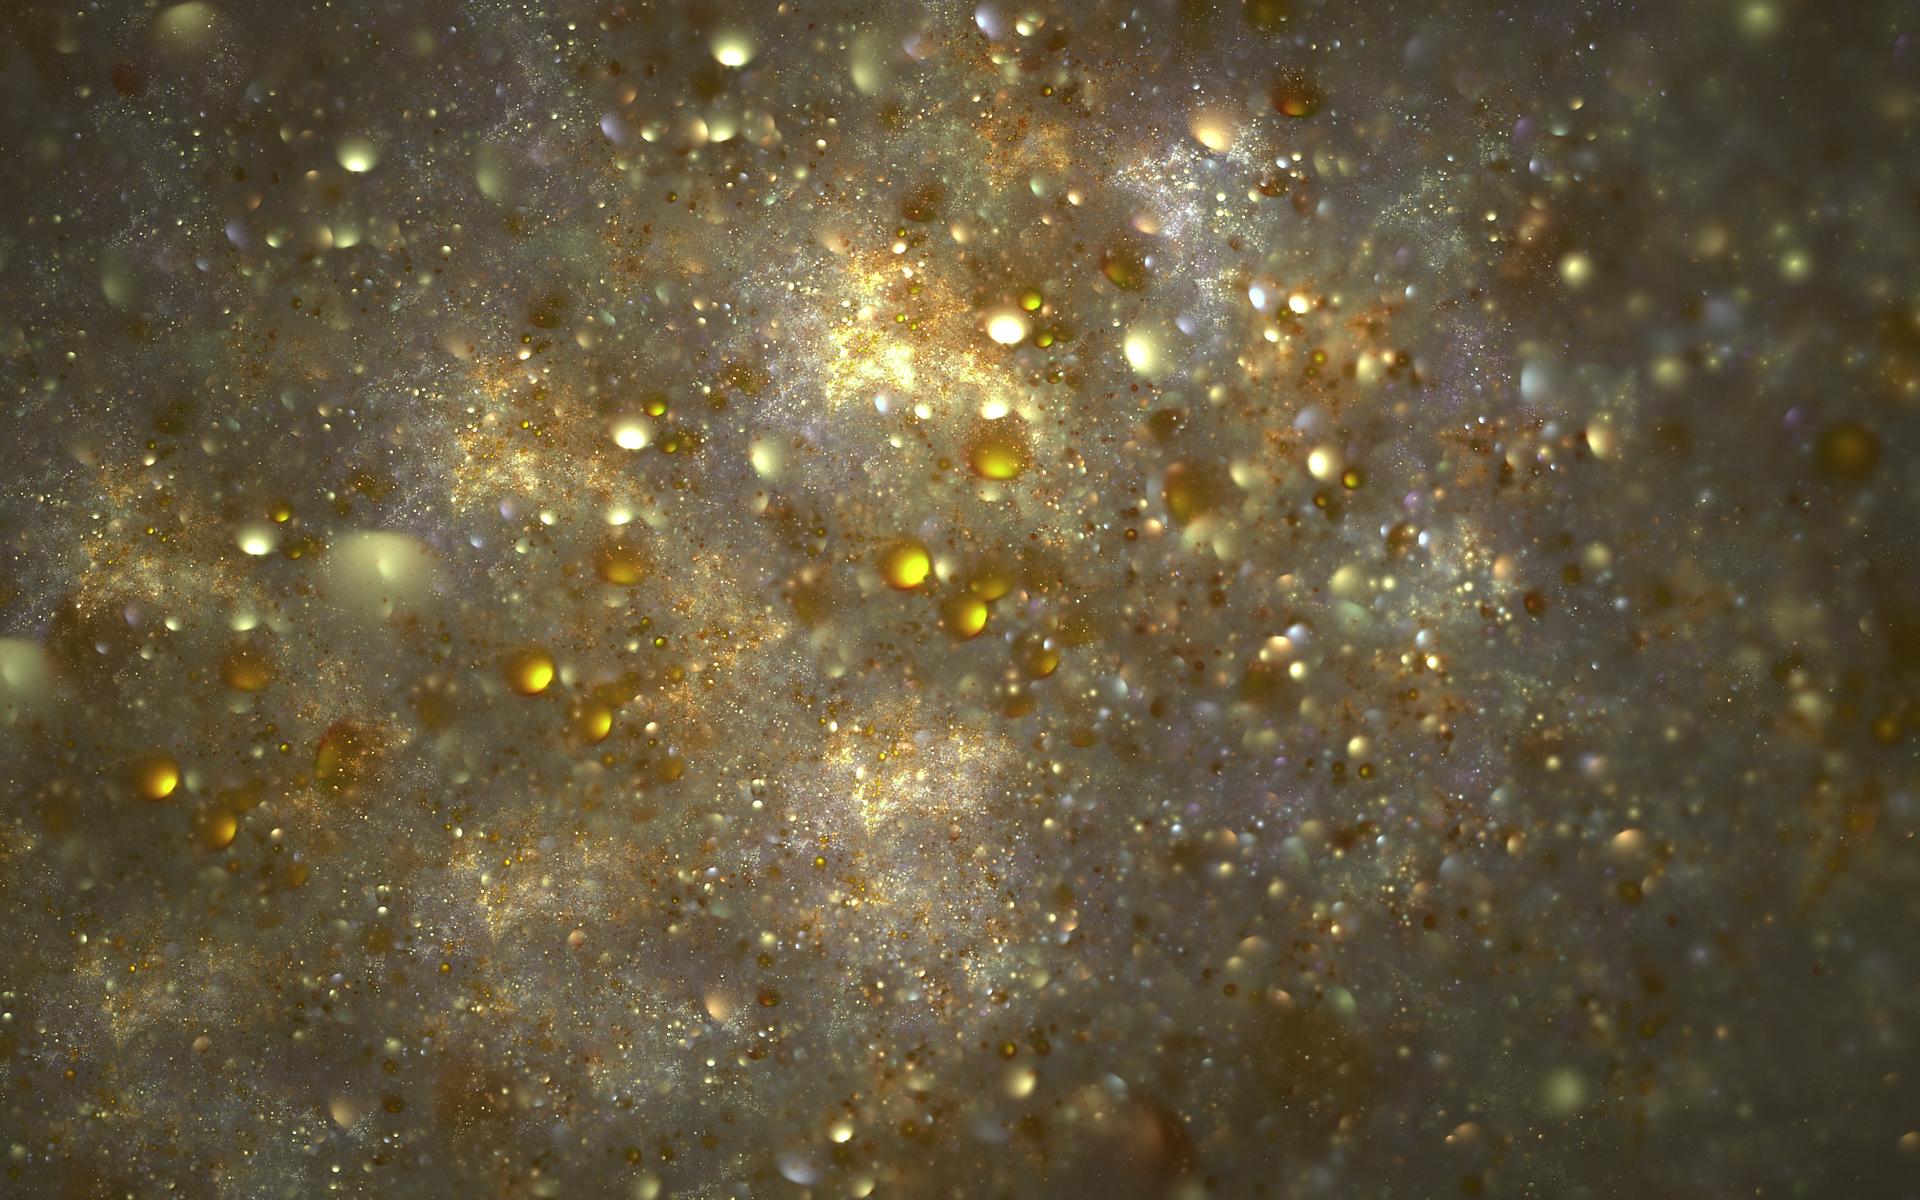 Free Texture Stock - Golden Spots (1920x1200 px)